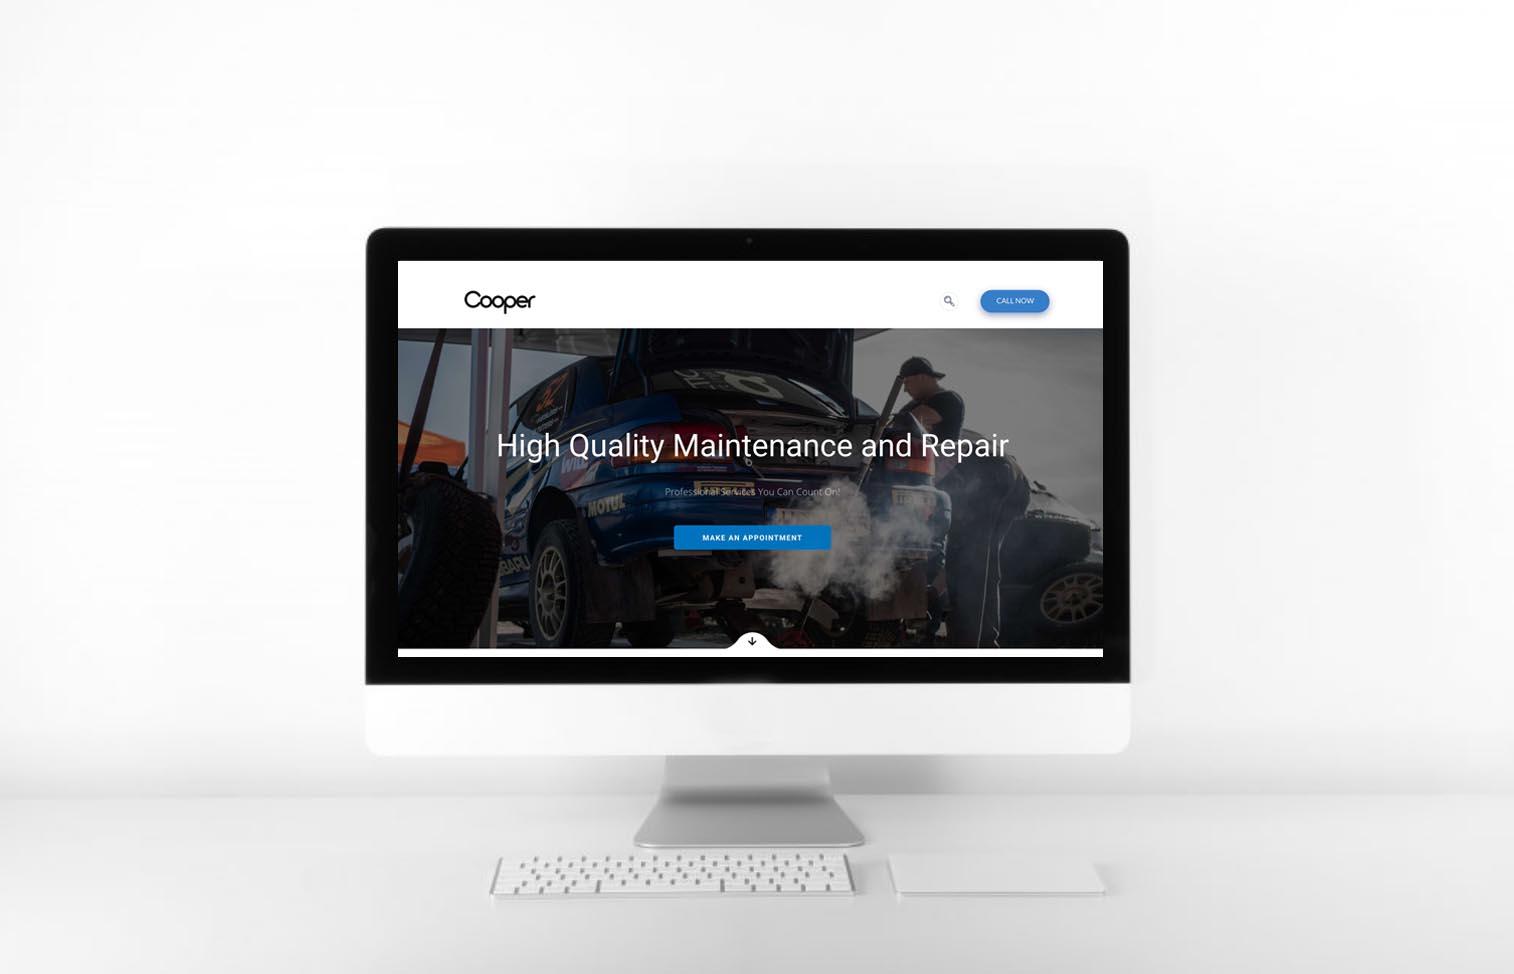 desktop-cooper-auto-website-design-company-2